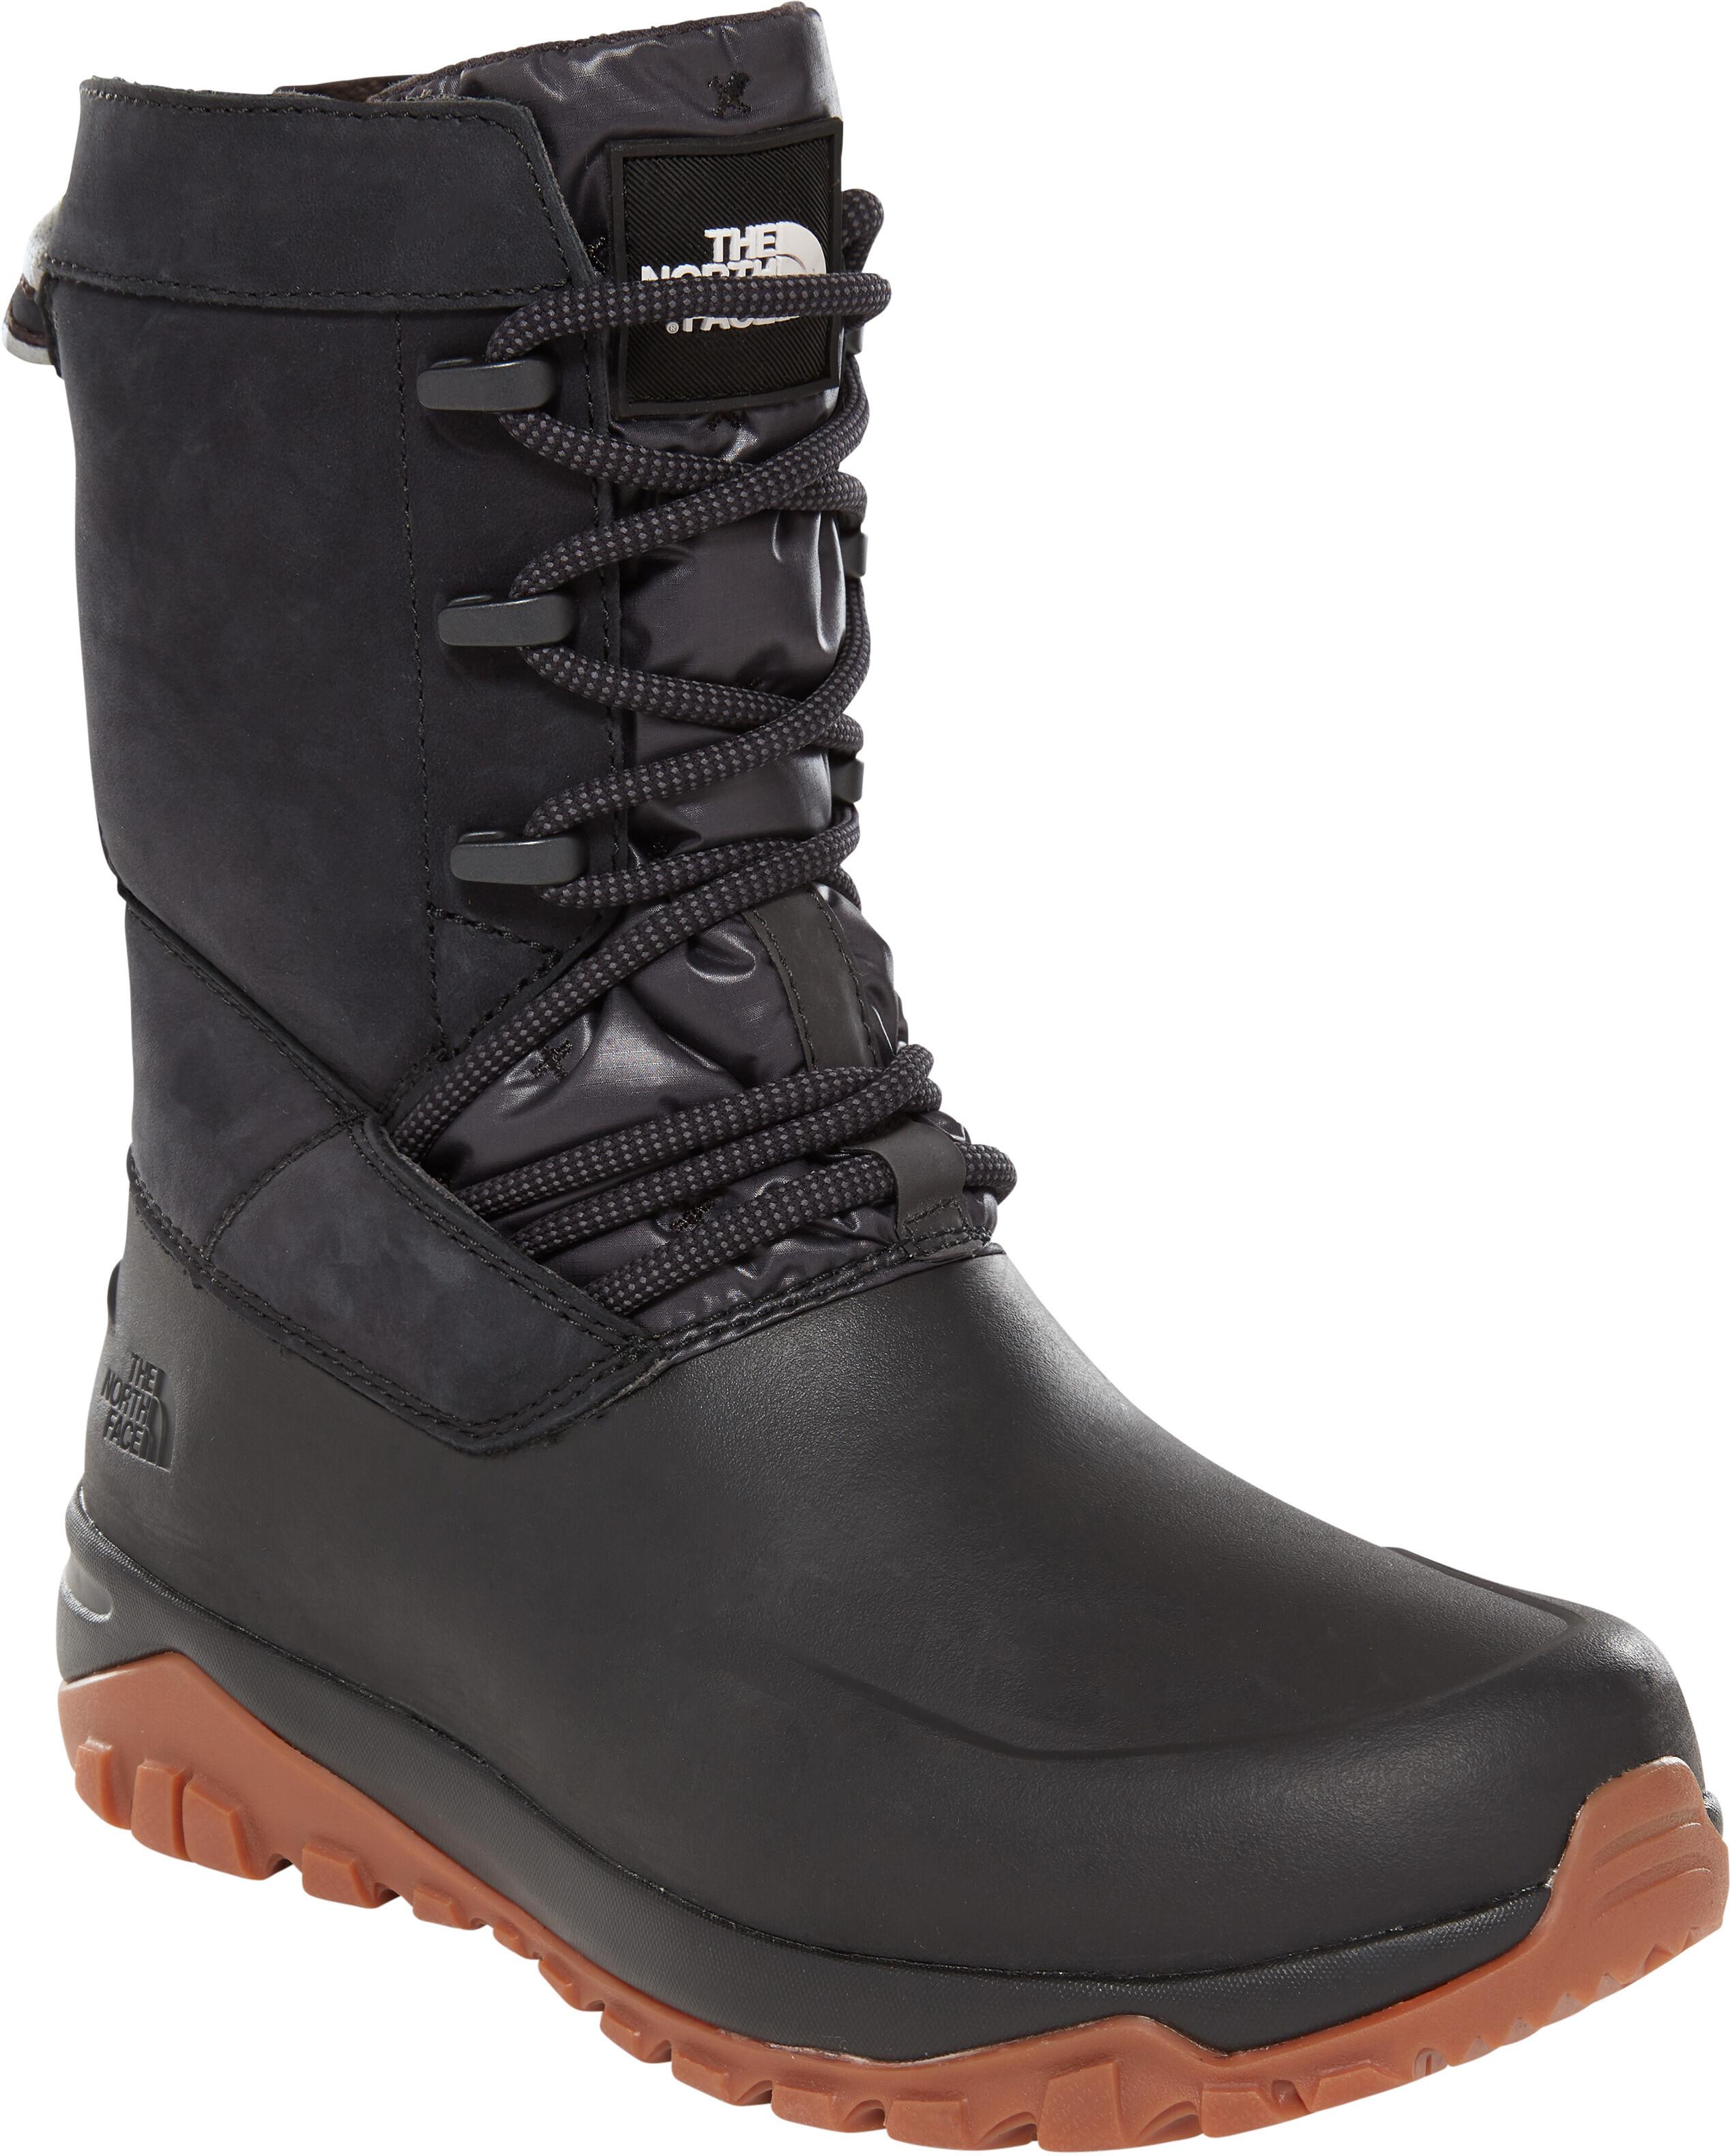 e26c4507c The North Face Yukiona Mid Boots Women tnf black/tnf black